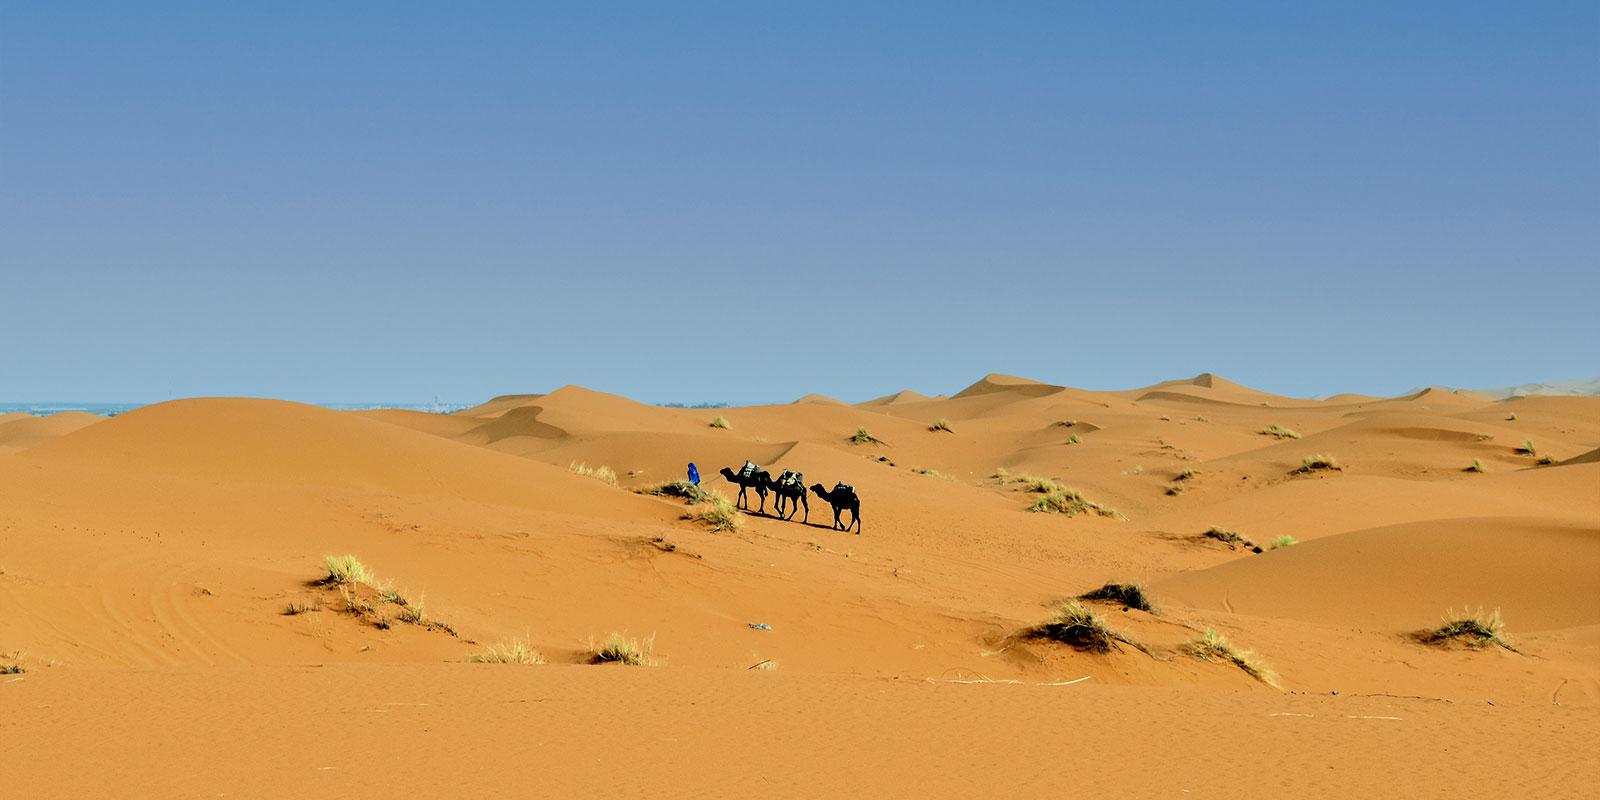 The endless Sahara